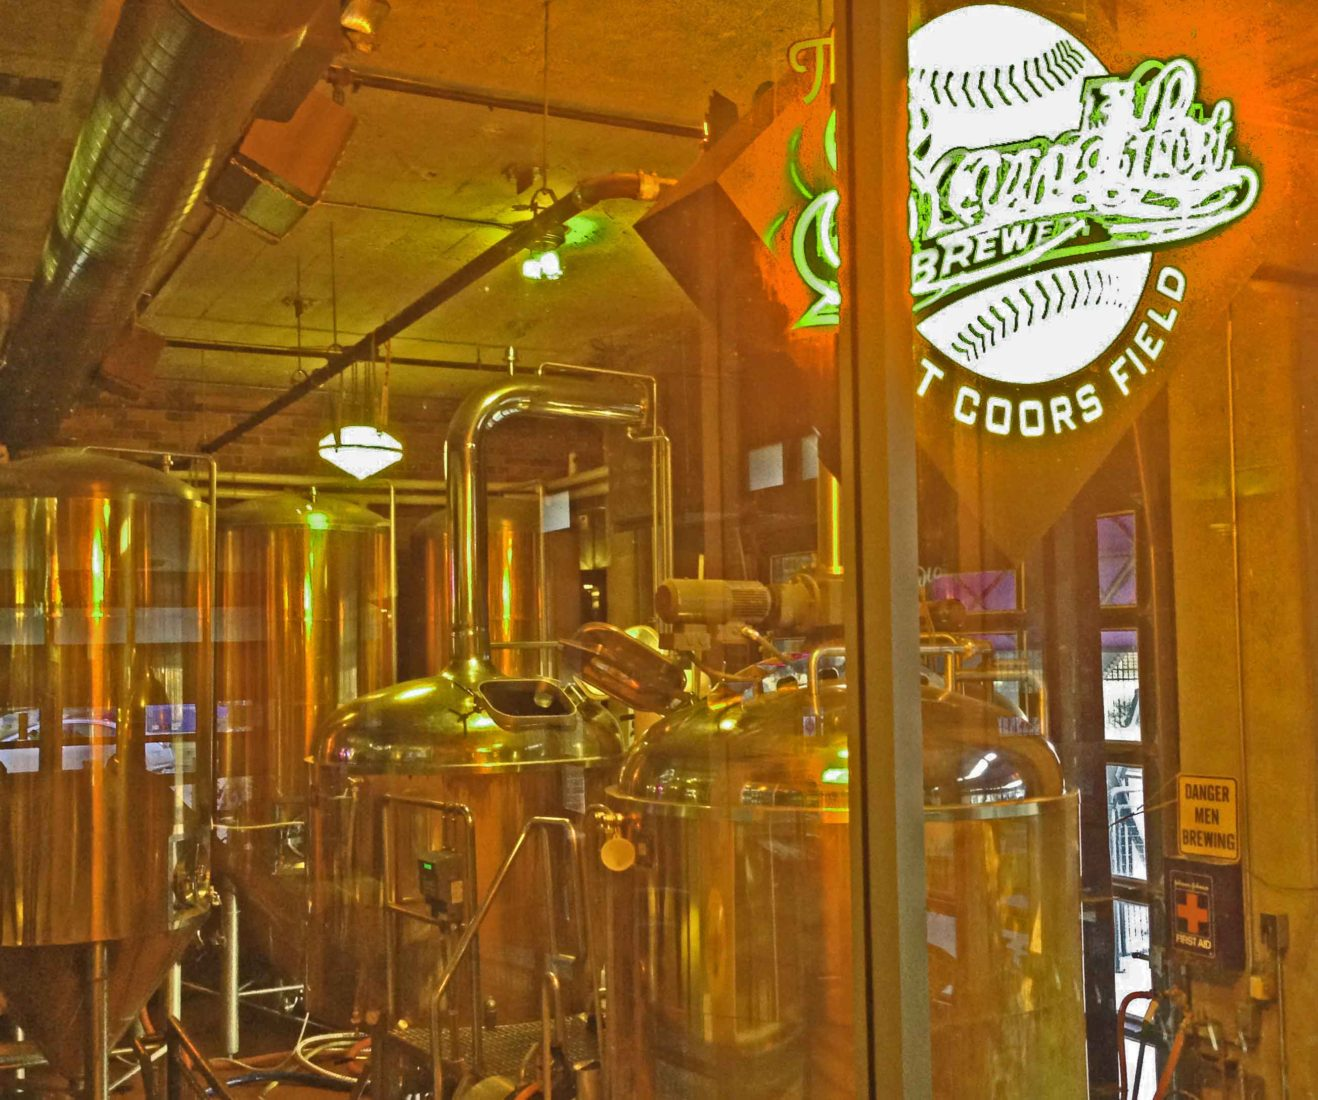 198. Sandlot Brewery, Denver CO 2014